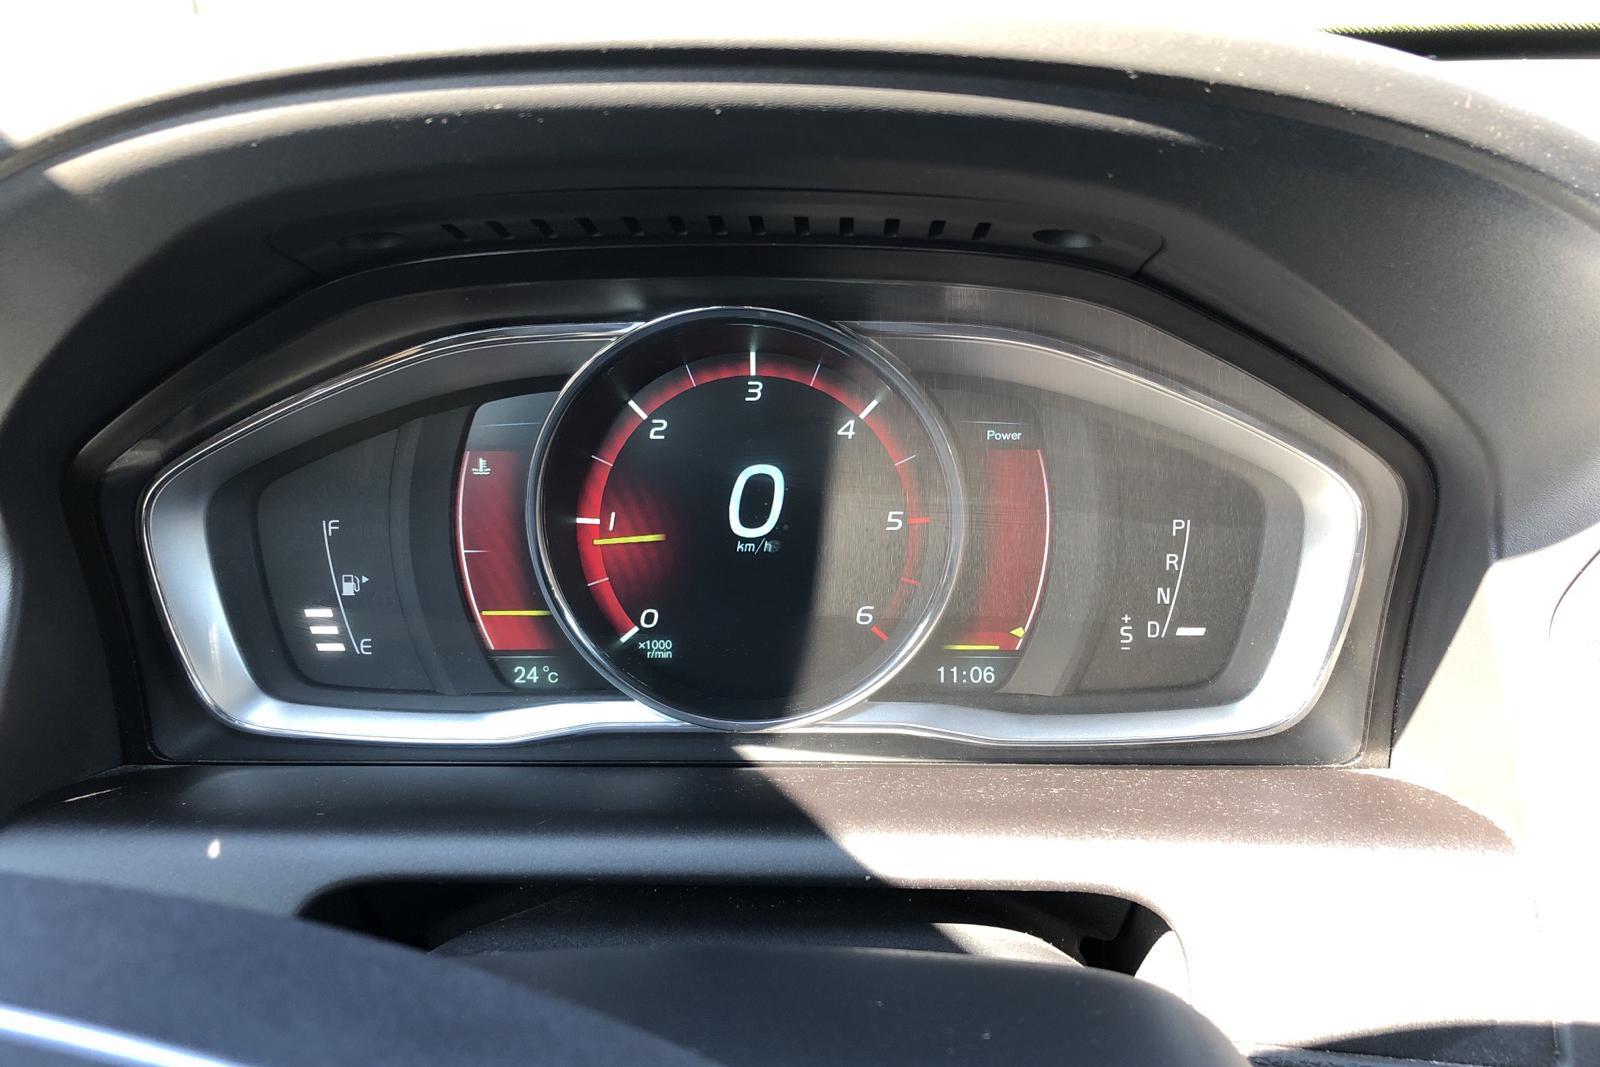 Volvo XC60 D4 2WD (181hk) - 17 575 mil - Automat - röd - 2014